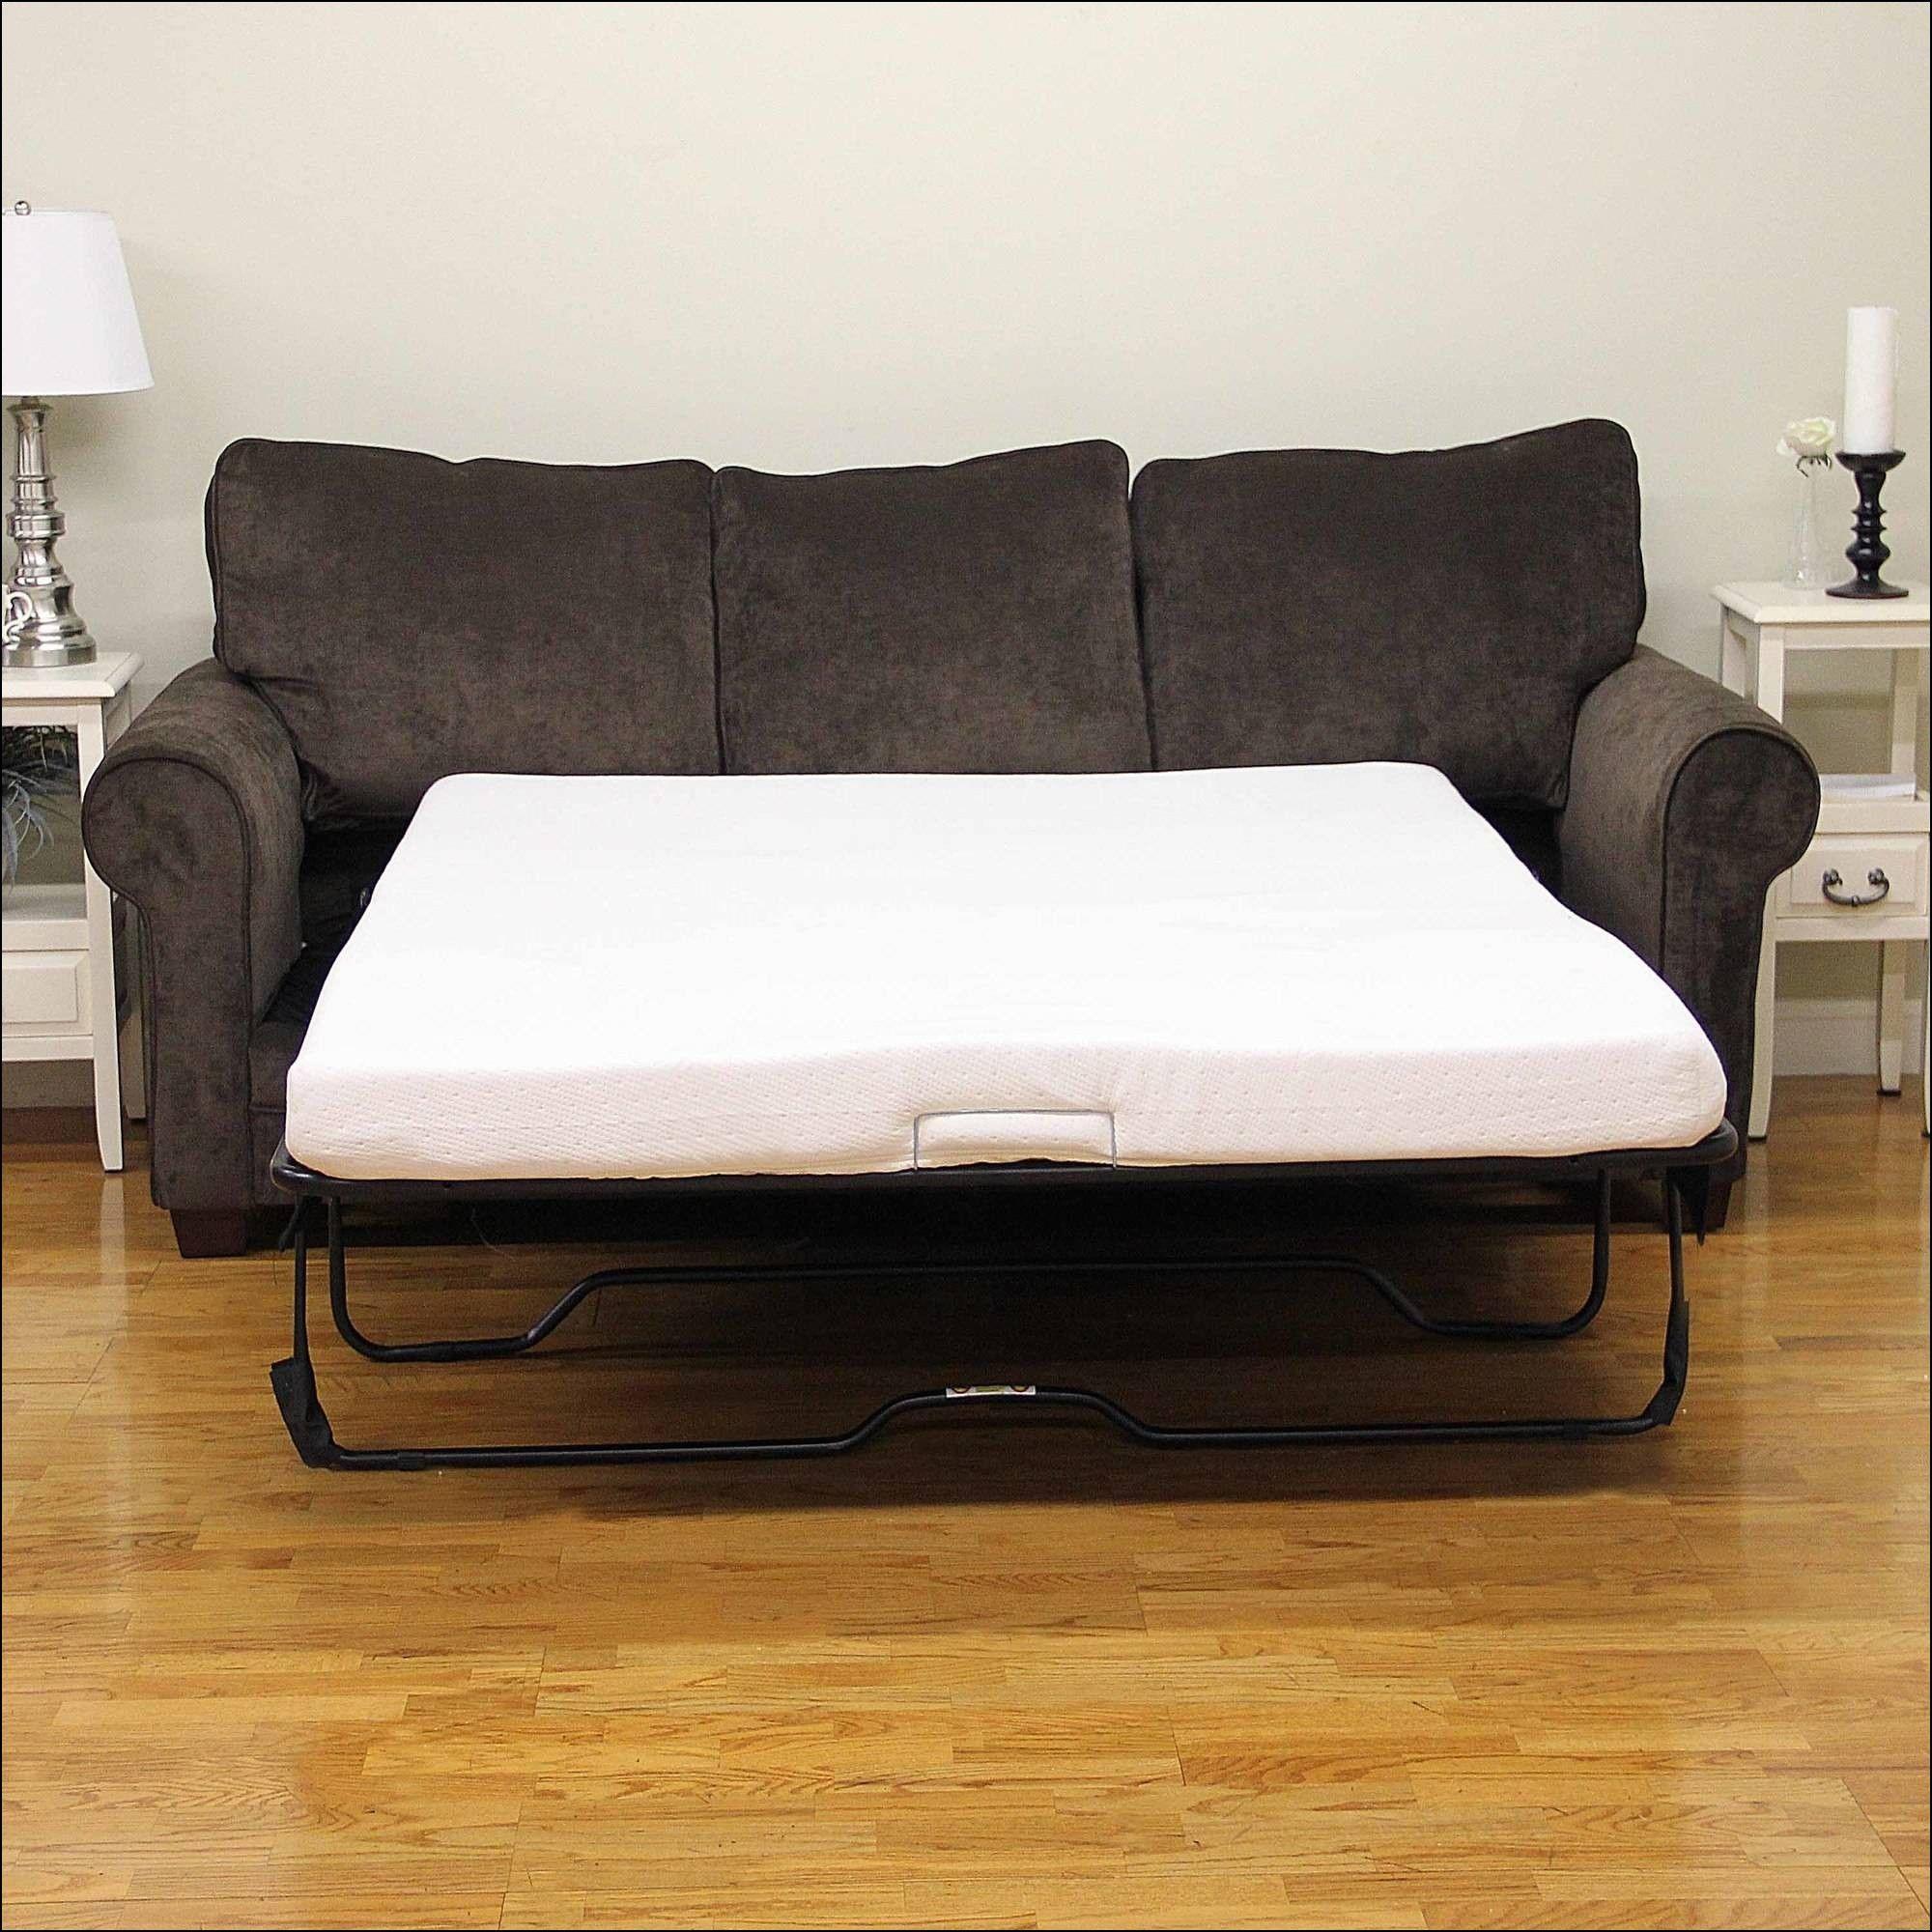 Delightful Memory Foam Mattress Topper For Sofa Bed